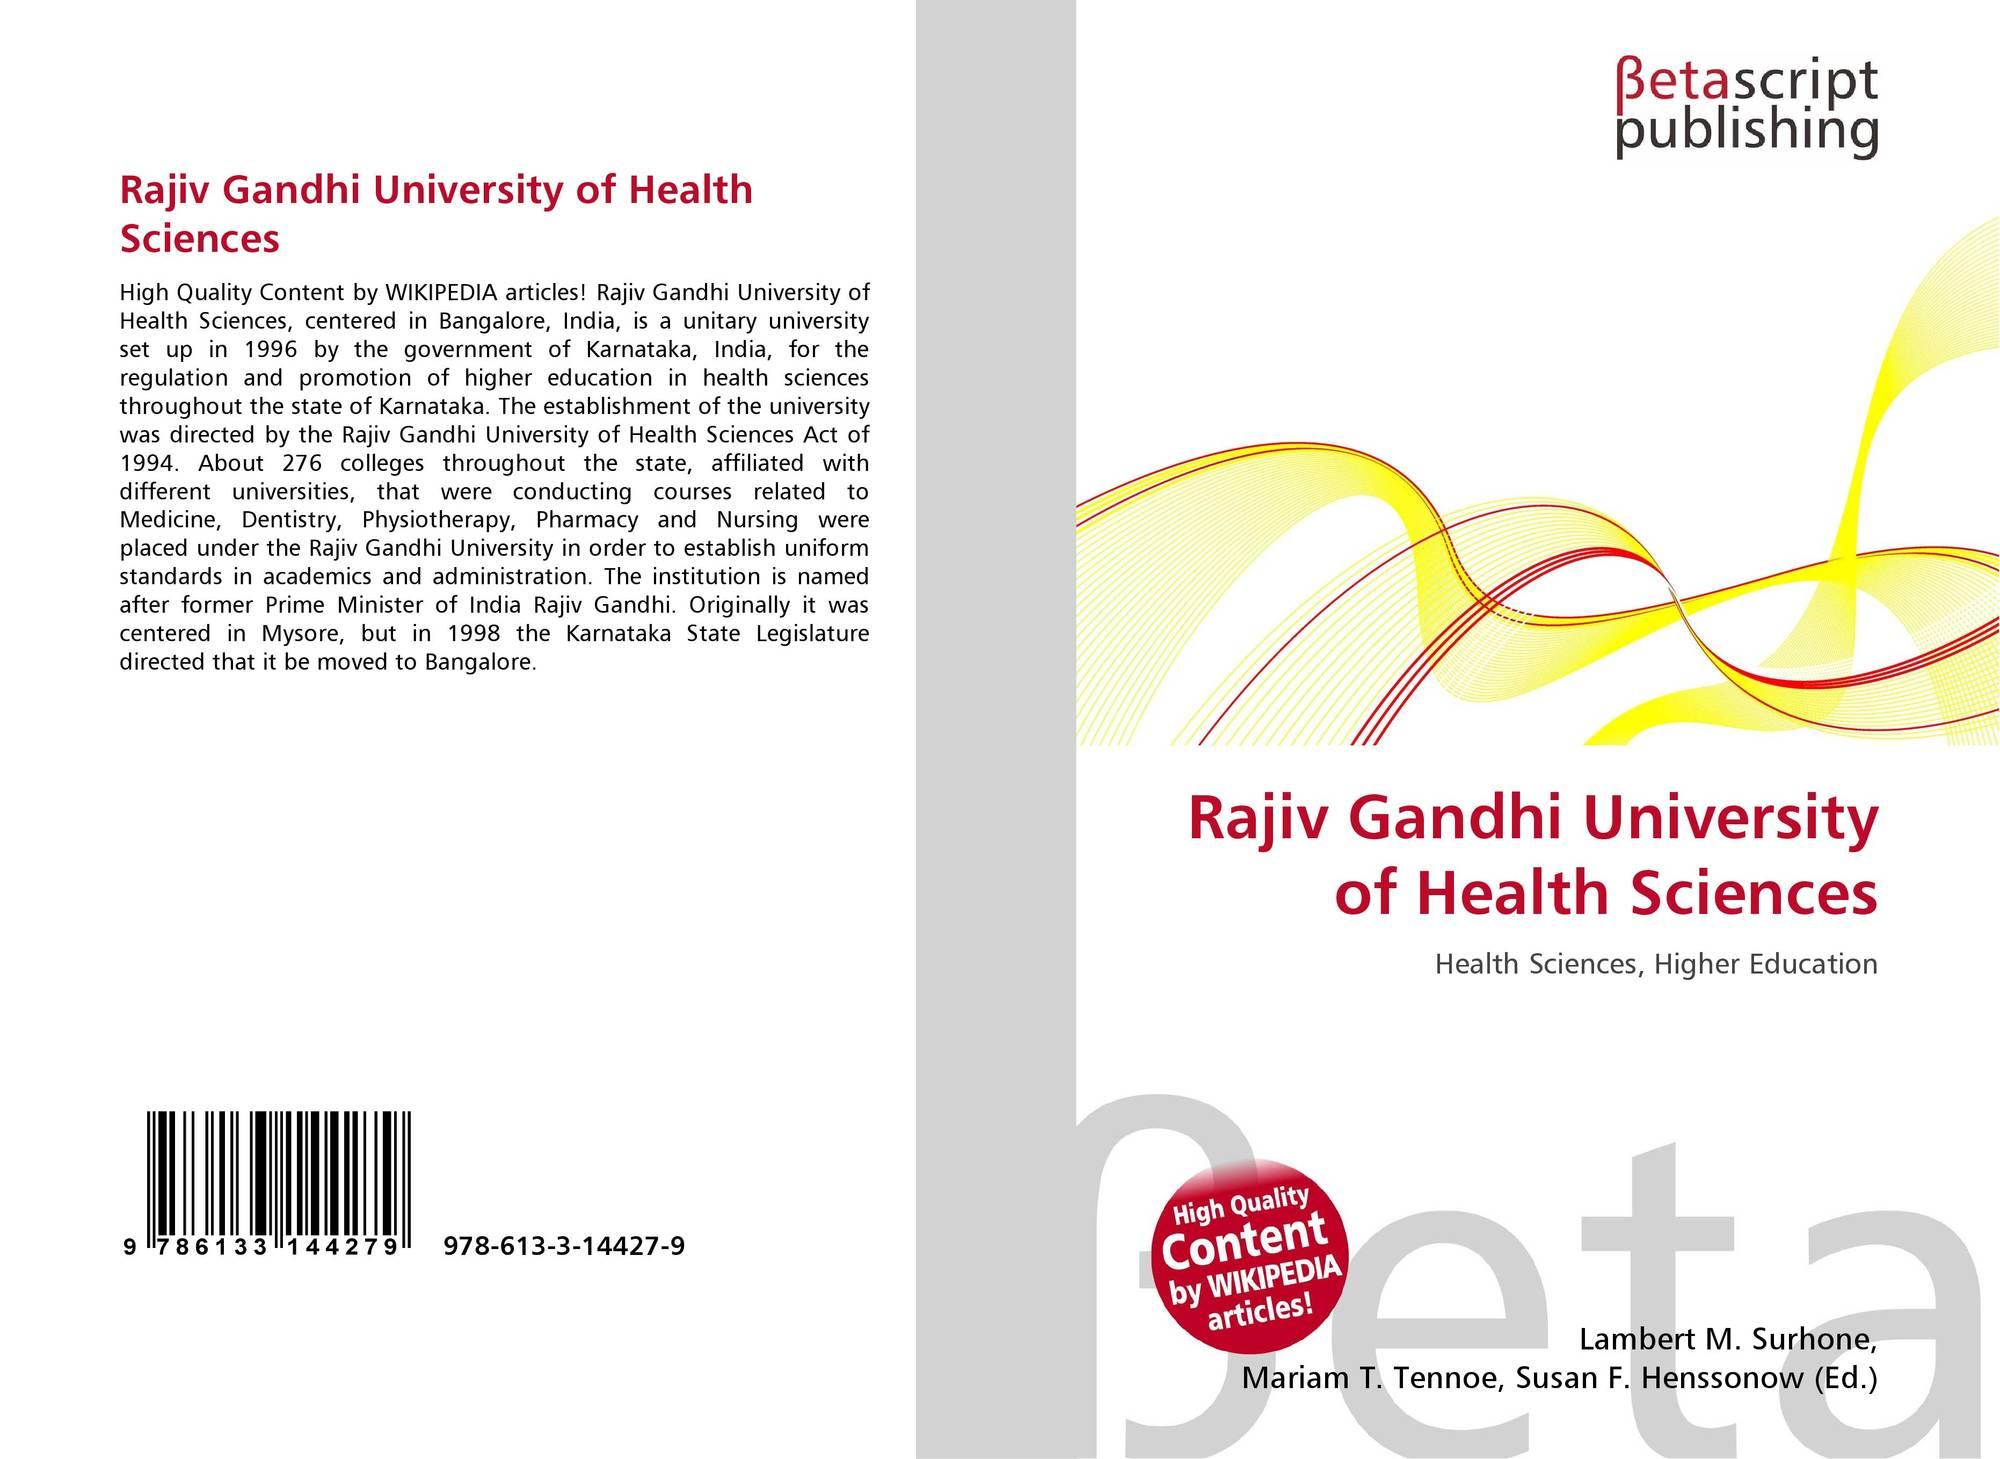 rajiv gandhi university of health sciences dissertation Rajiv gandhi university of health sciences bangalore, karnataka proforma for registration of subject for dissertation ms.